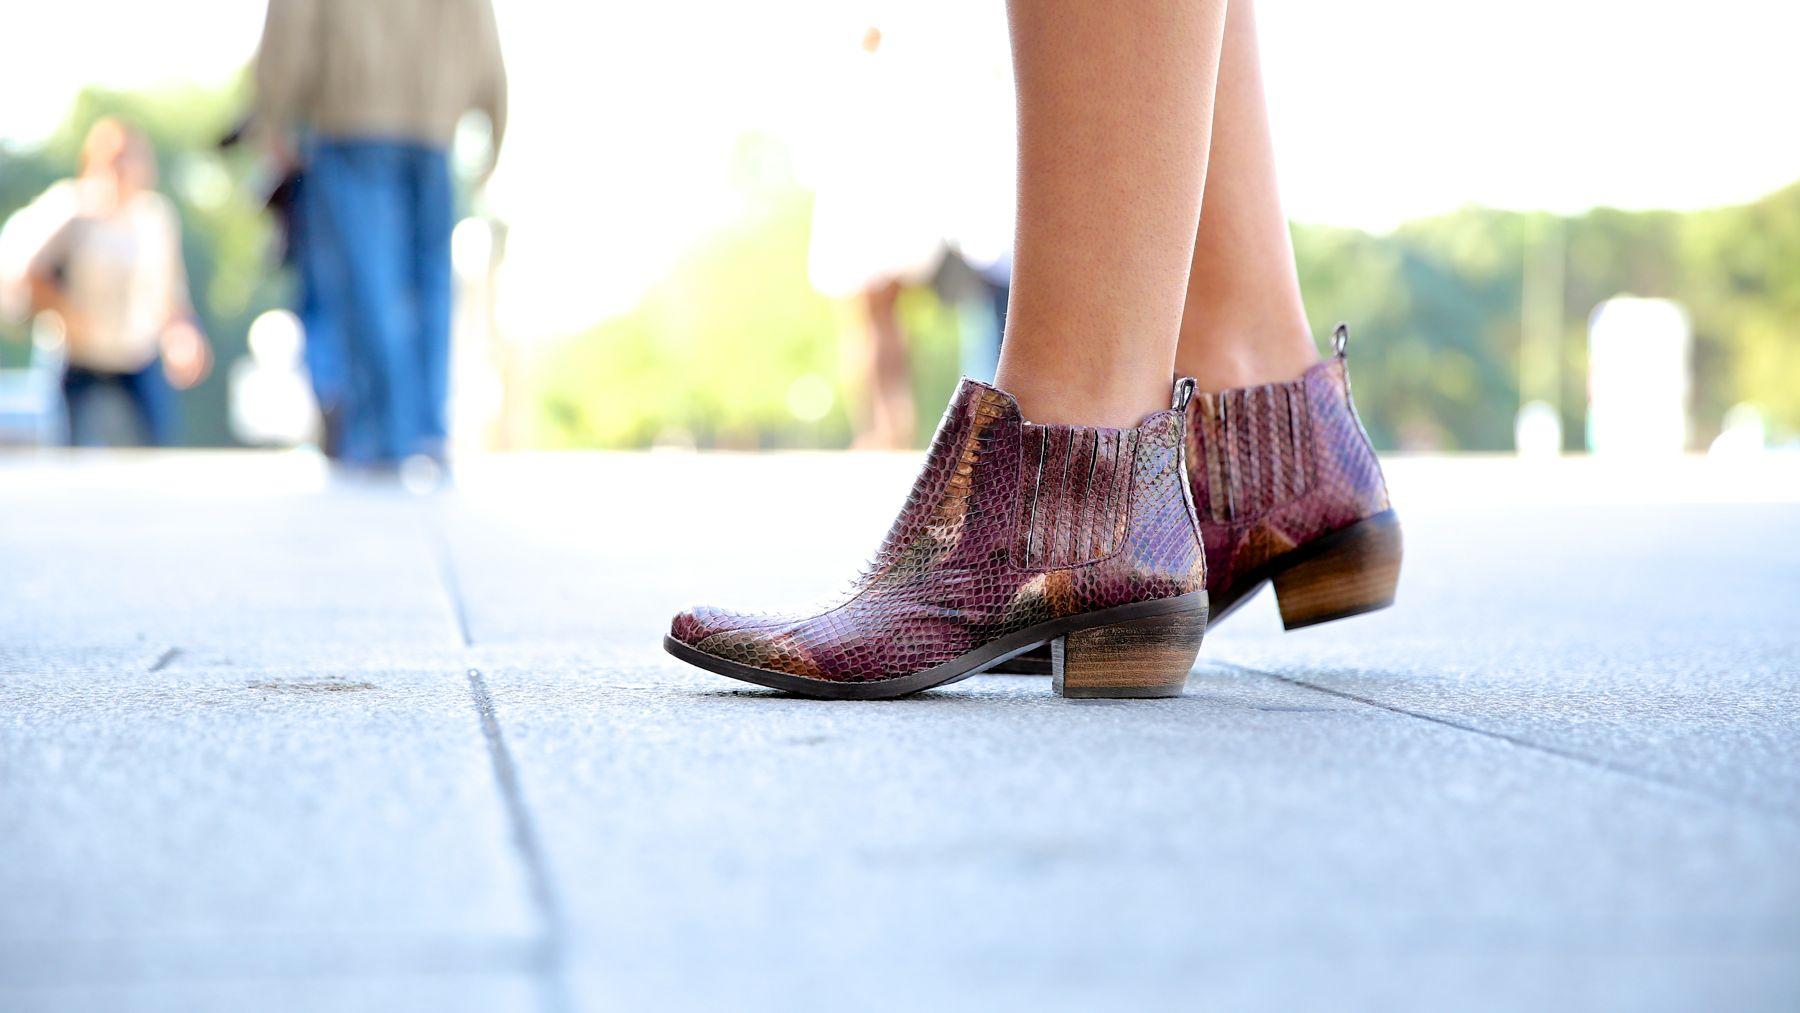 trendy_taste-look-outfit-street_style-ootd-blog-blogger-fashion_spain-moda_españa-girissima.com-sweatshirt-sudadera-estampado-crocodile-cocodrilo-botines-booties-pink_skirt-falda_rosa-1